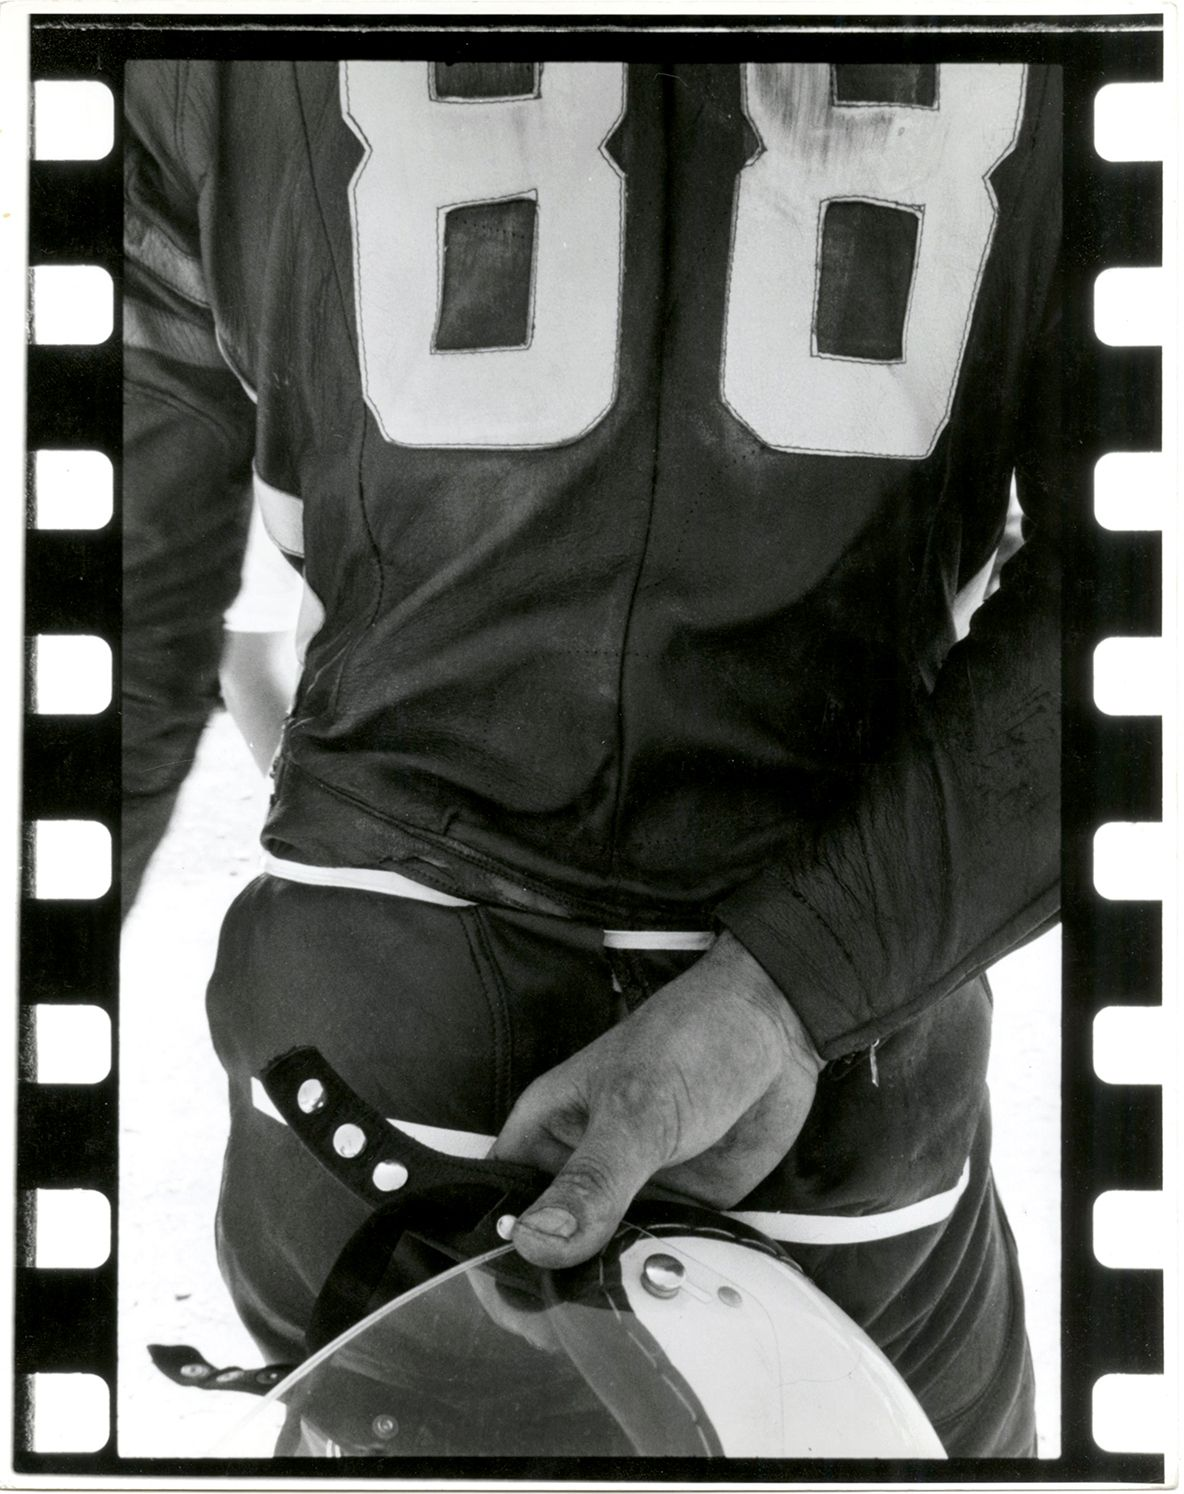 Copyright Danny Lyon / Magnum Photos, Torello Tachhi's Back, Louden, NH, from The Bikeriders, 1965